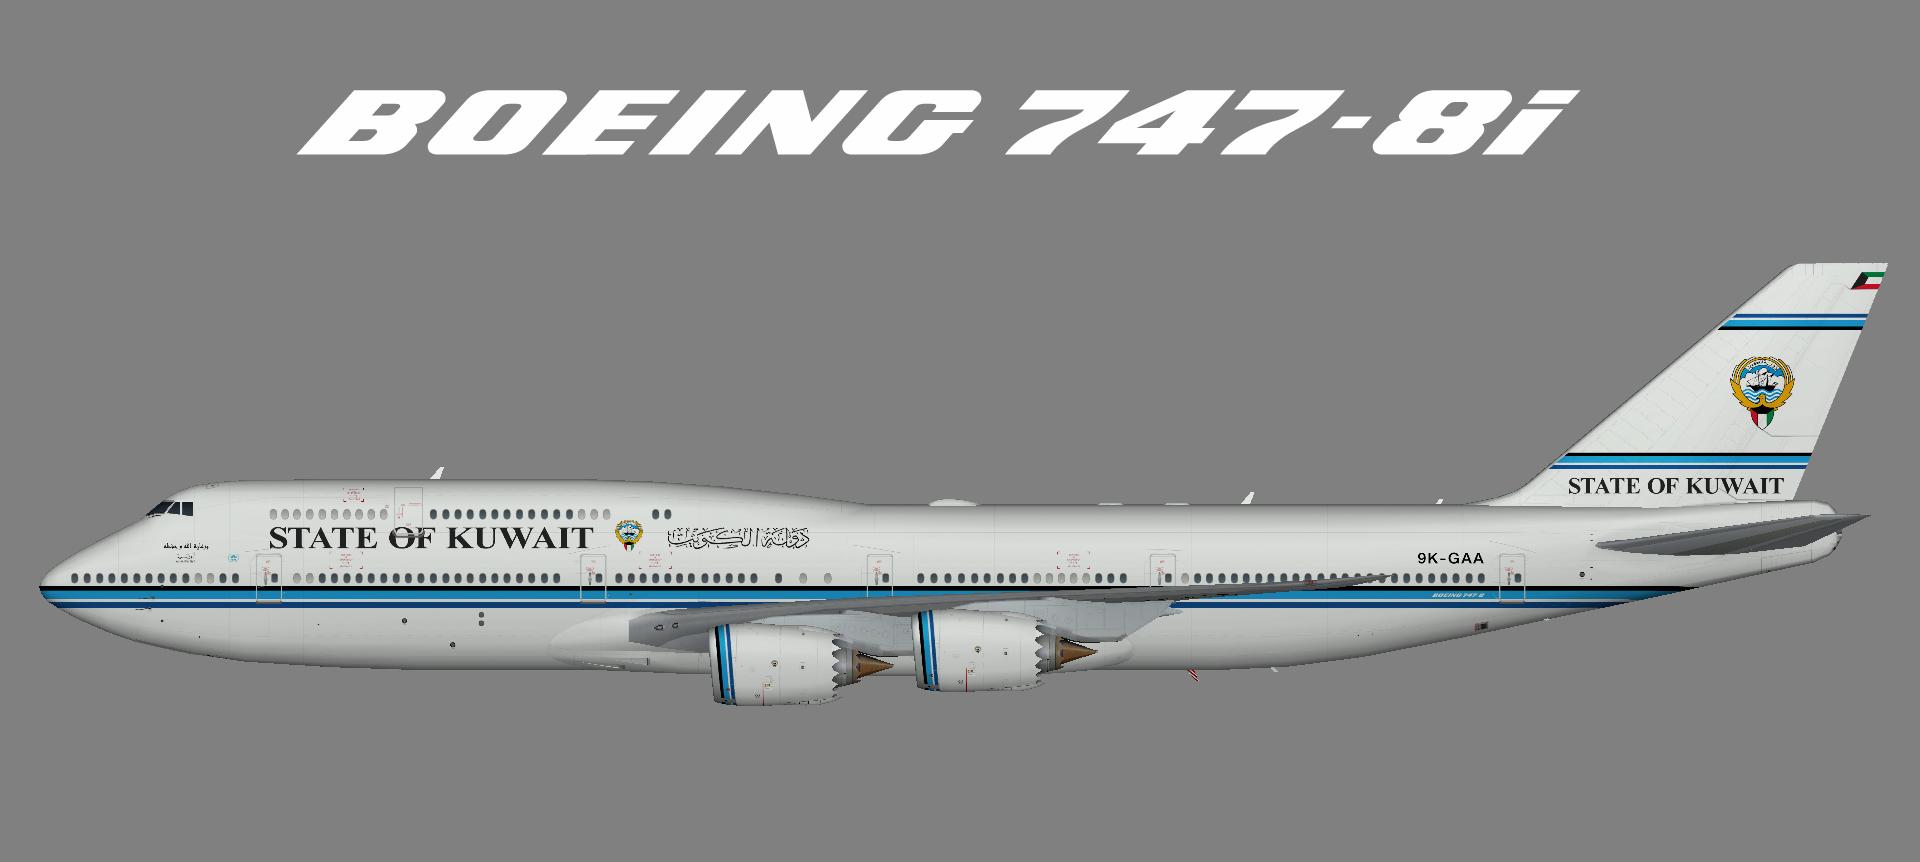 state-of-kuwait-747-8i